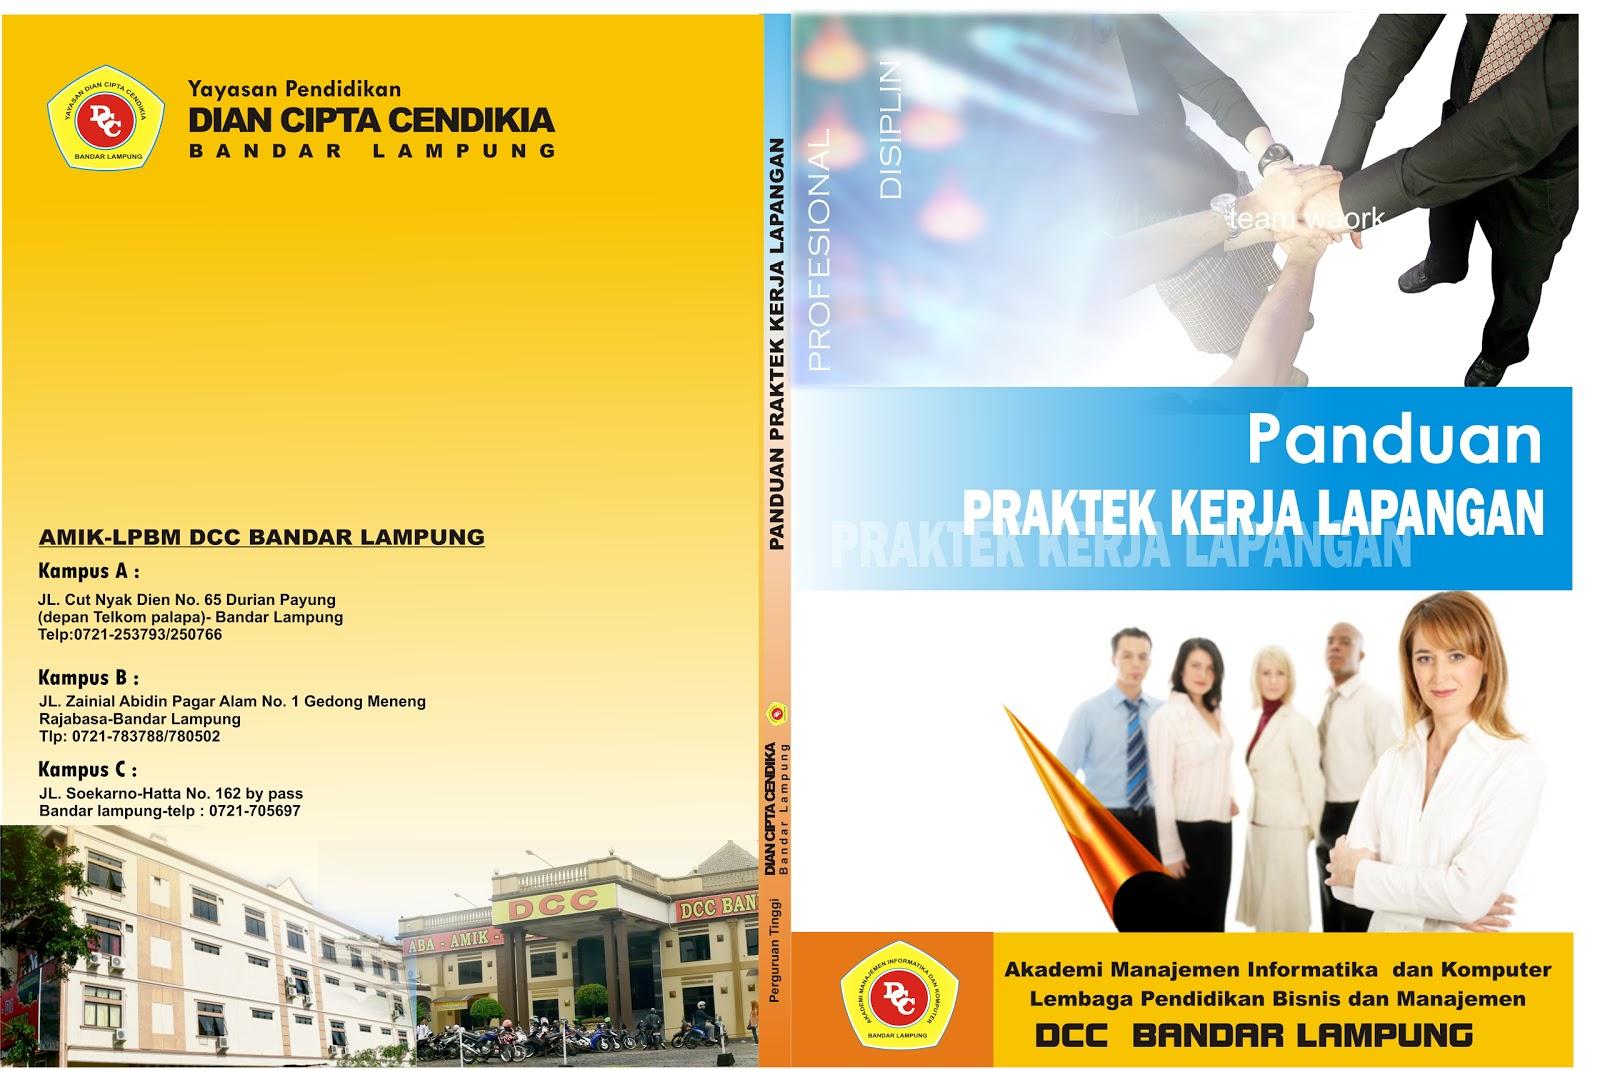 : coreldraw design graphic download free download gratis portofolio